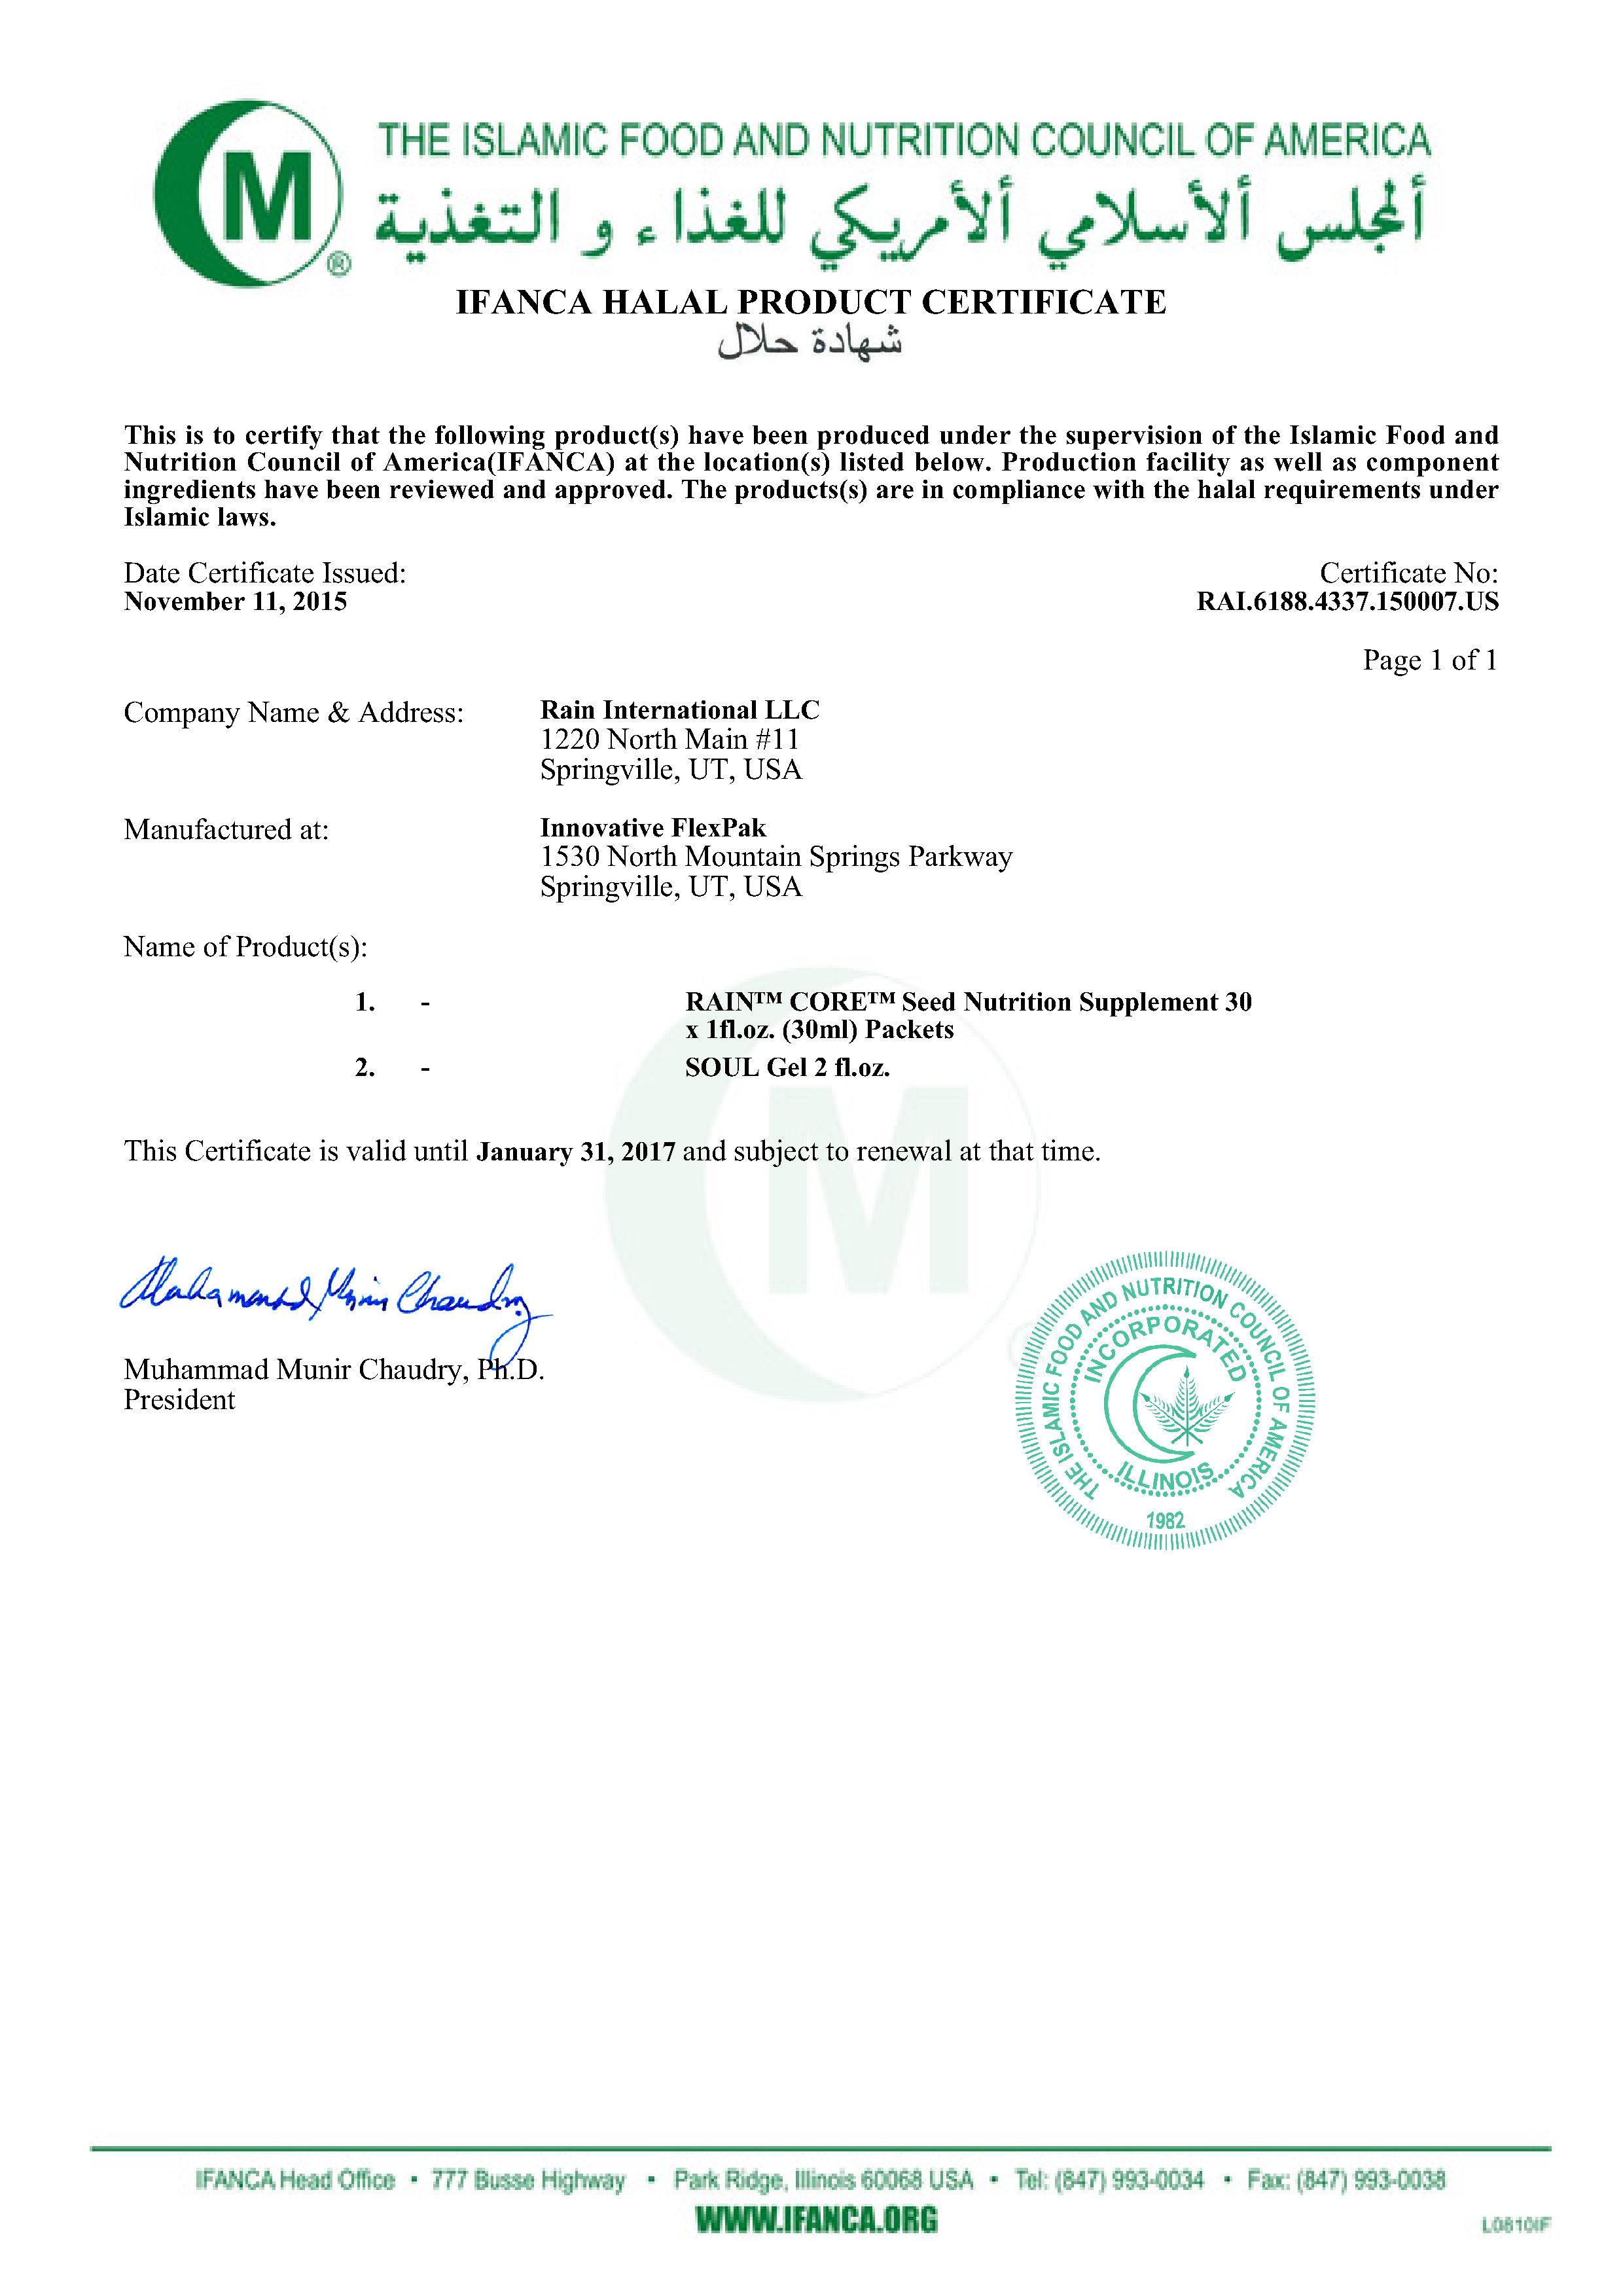 Сертификат халяль для Rain Core и Rain Soul (IFANCA)